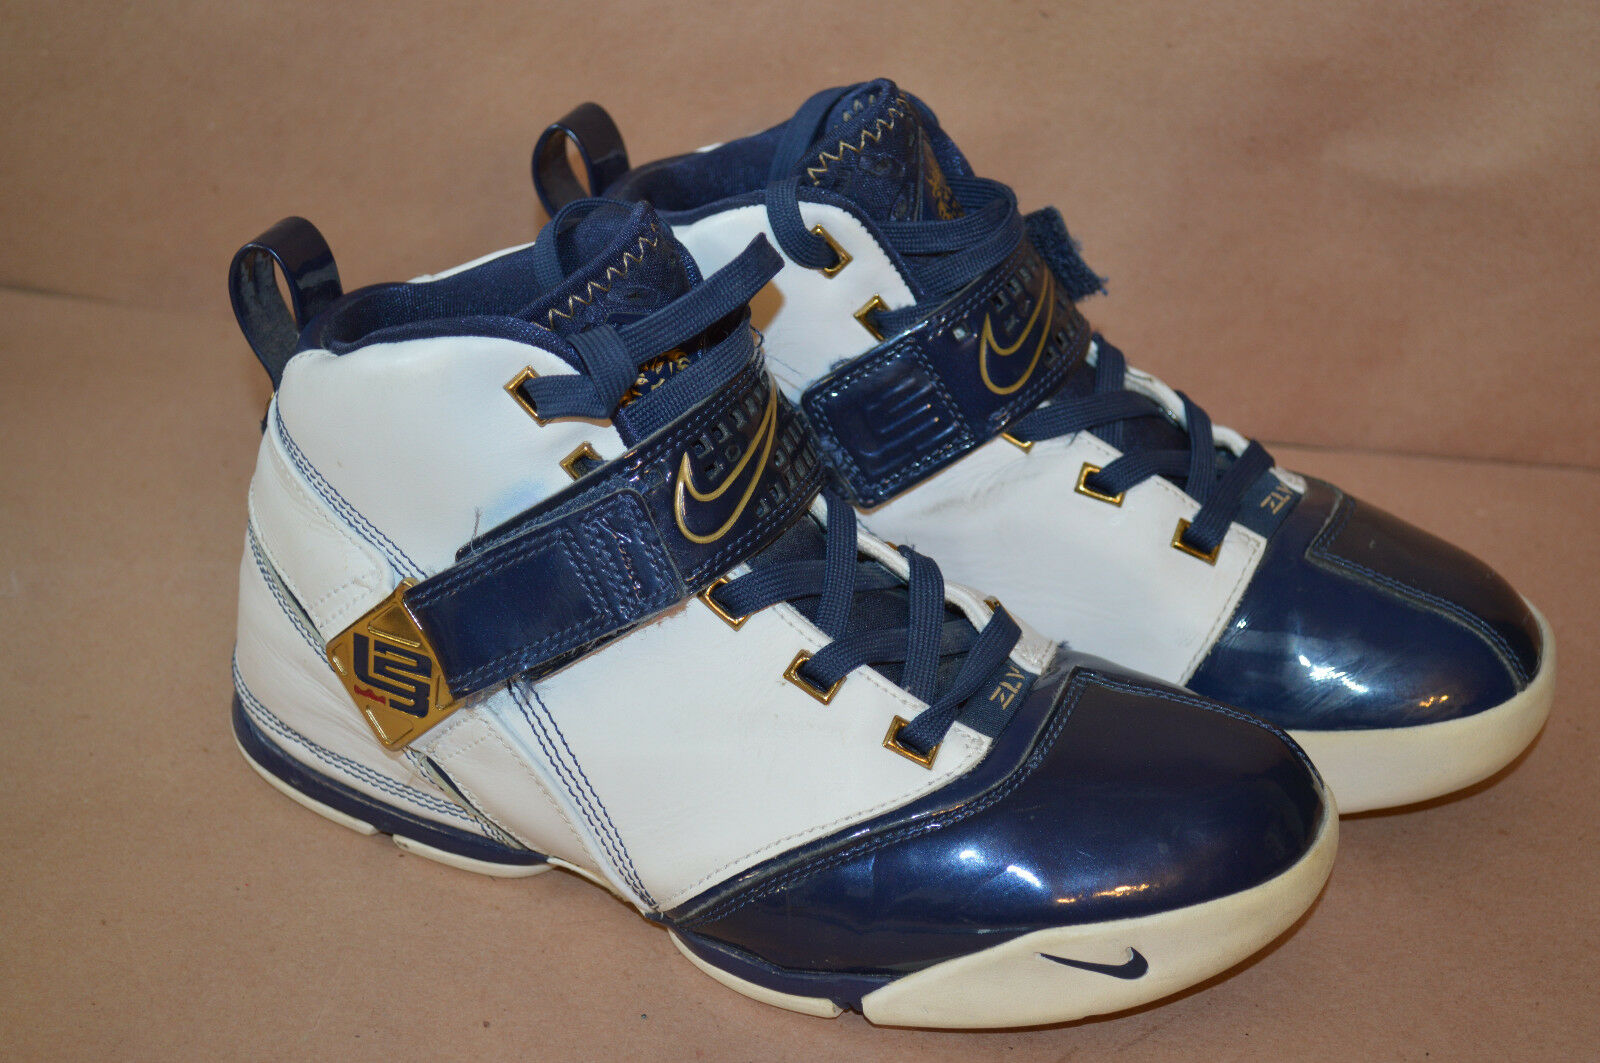 Nike air zoom lebron / 5 weiß - blau 317335-141 größe 5.5y